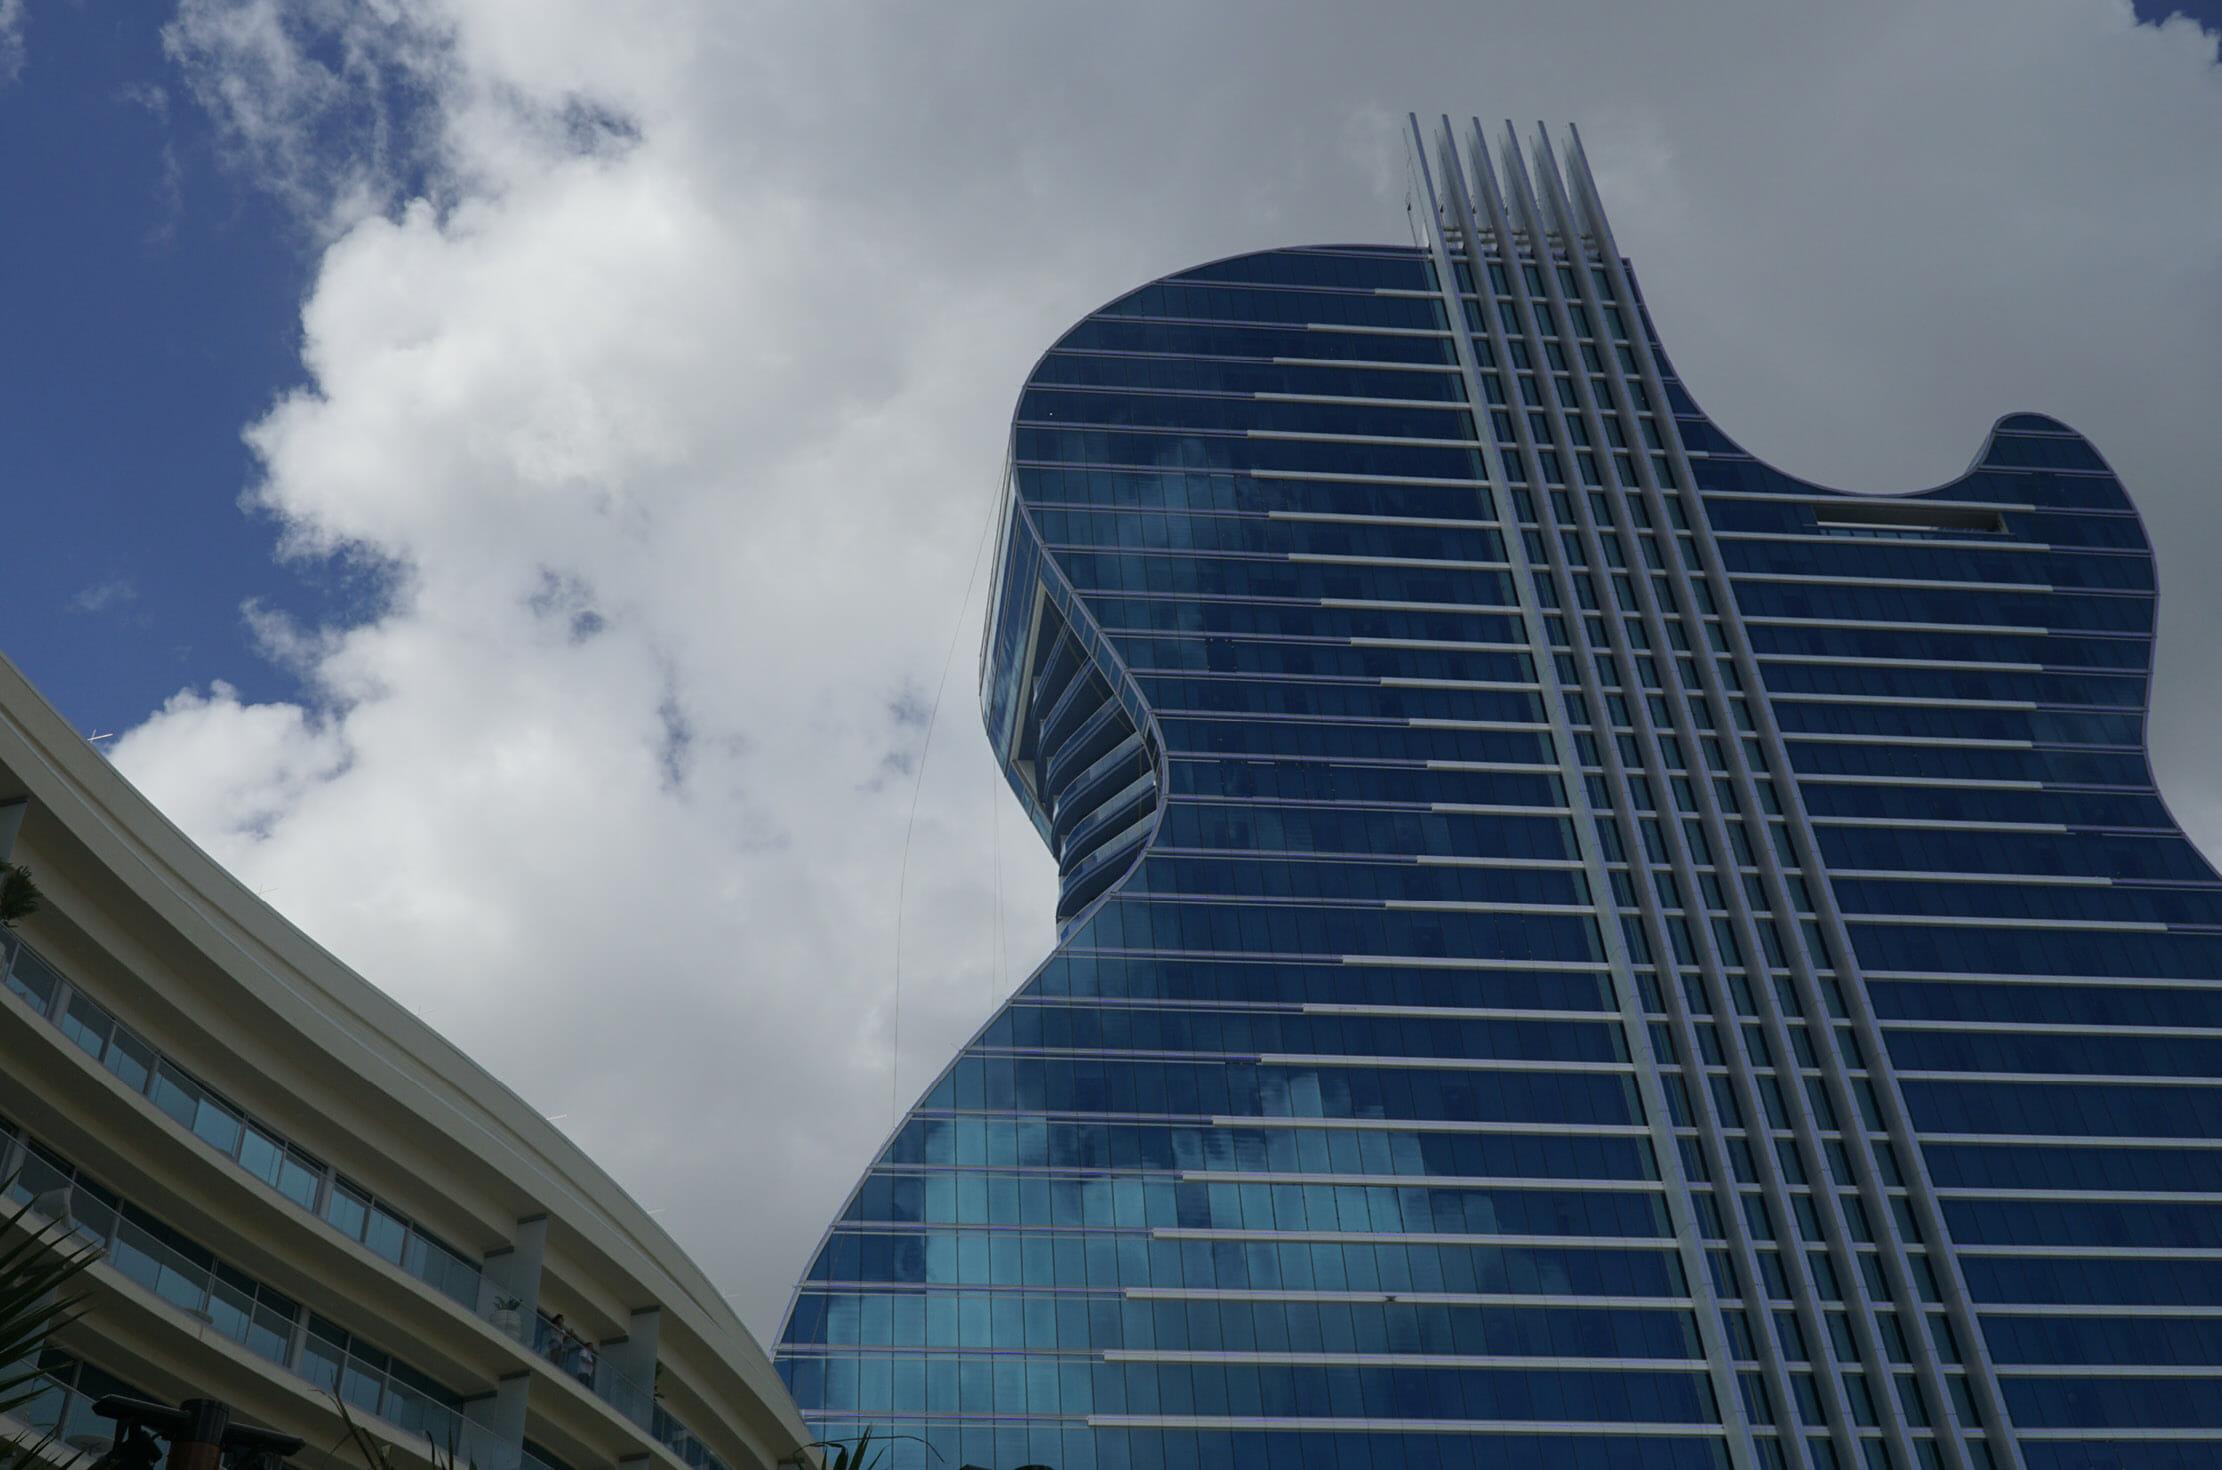 $1.5 BILLION GUITAR HOTEL